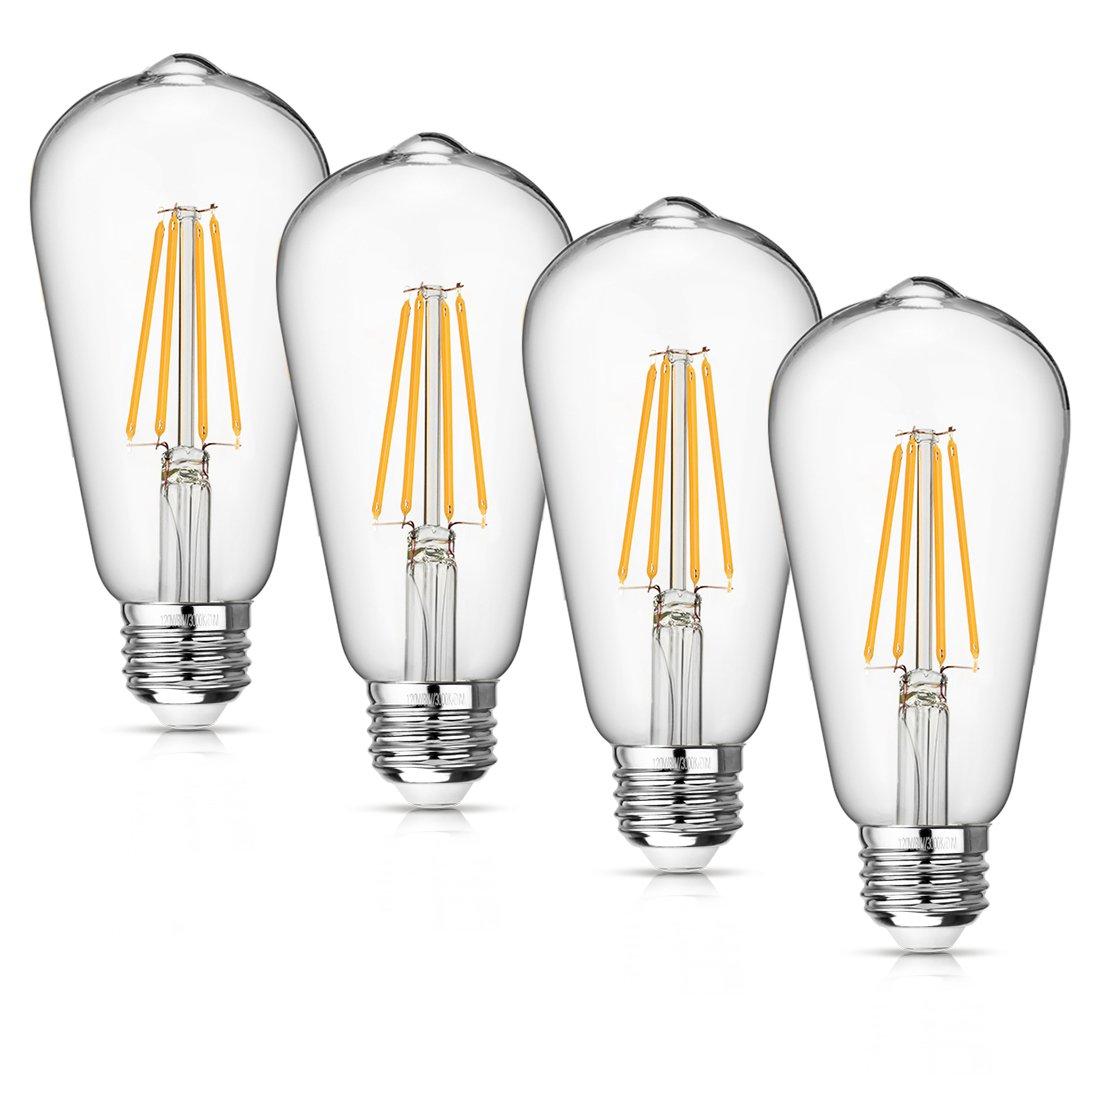 Vintage LED Edison Bulb Dimmable 8W Led Filament Light Bulb ST64 840 Lumen 3000K Soft White 75-100 Watt Incandescent Equivalent E26 Medium Base Decorative Antique Lamp for Home Bathroom Bedroom 4 Pack